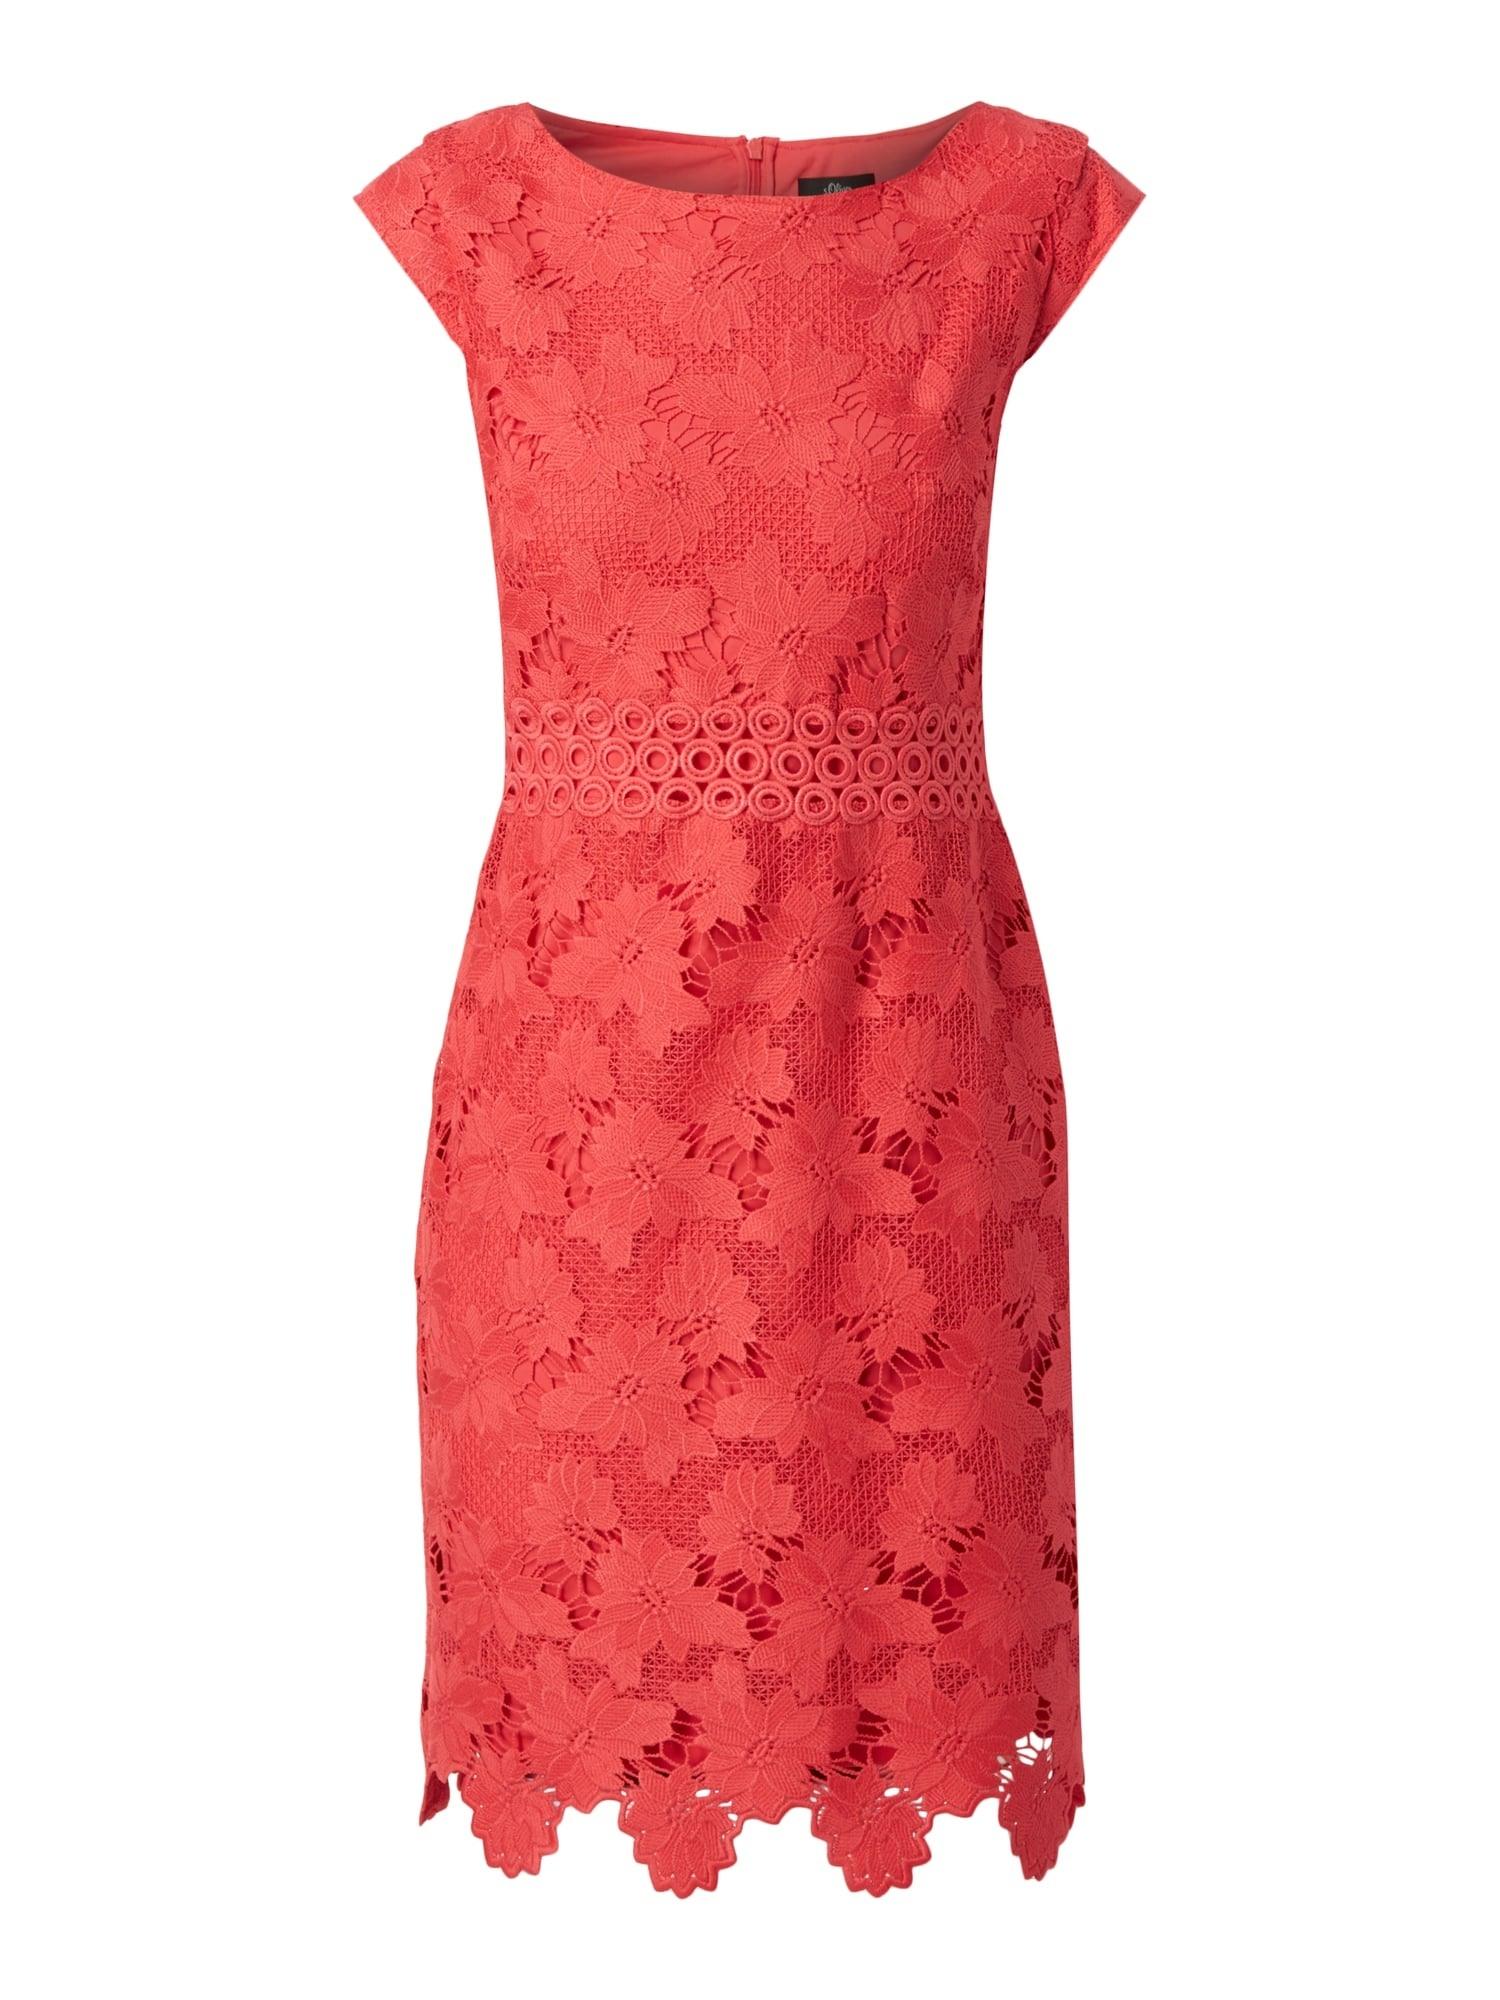 10 Leicht Kleid Koralle StylishAbend Top Kleid Koralle Stylish